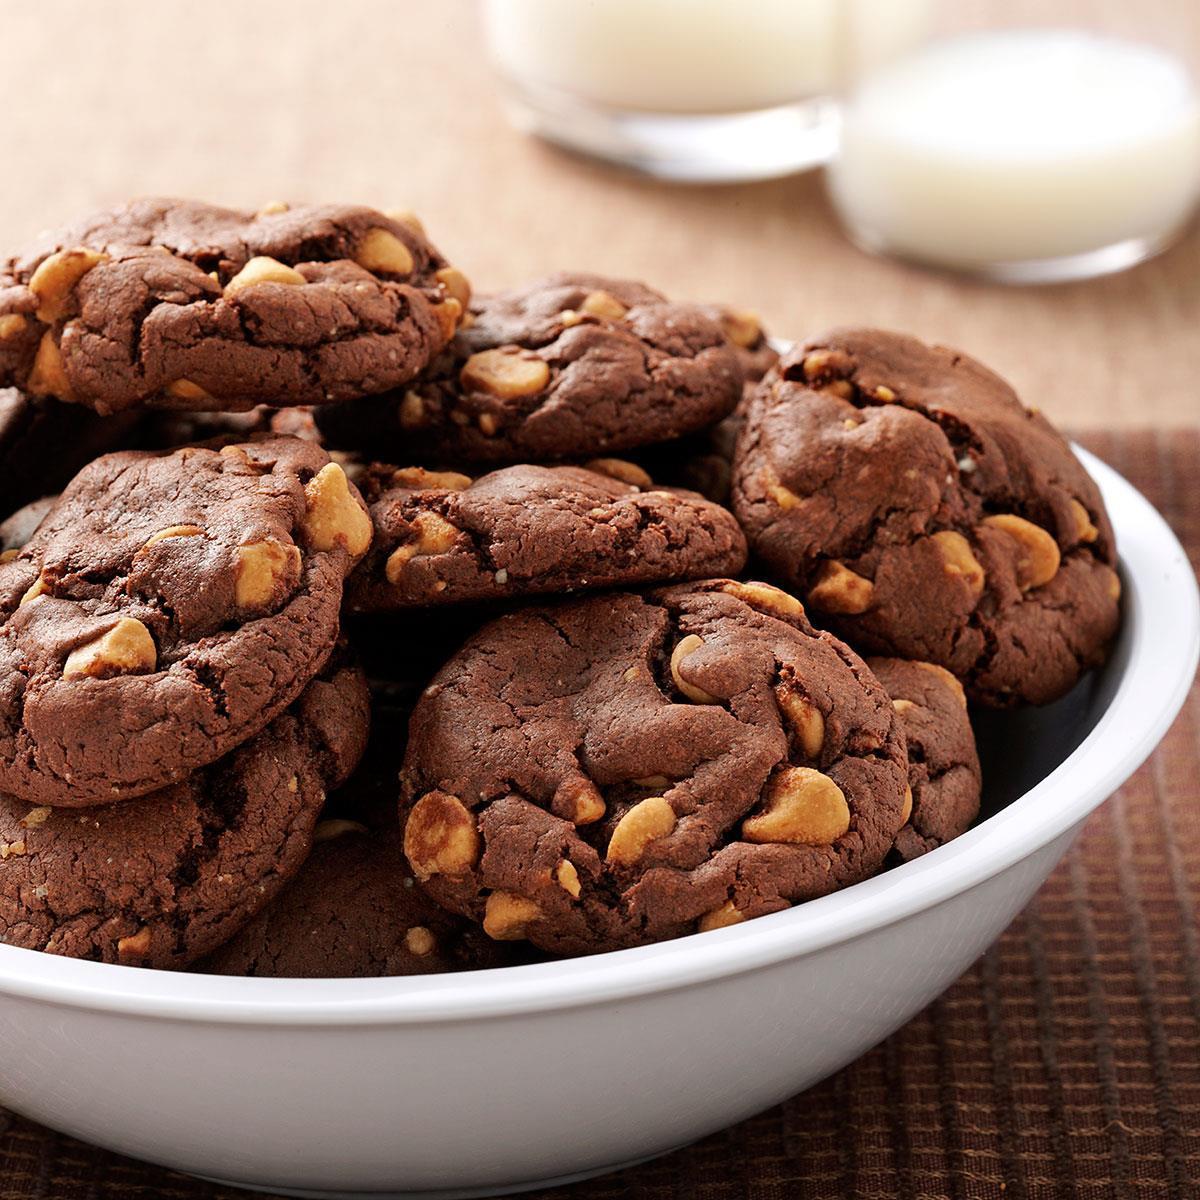 Peanut Butter Chocolate Cookies  Chocolate Peanut Butter Chip Cookies Recipe